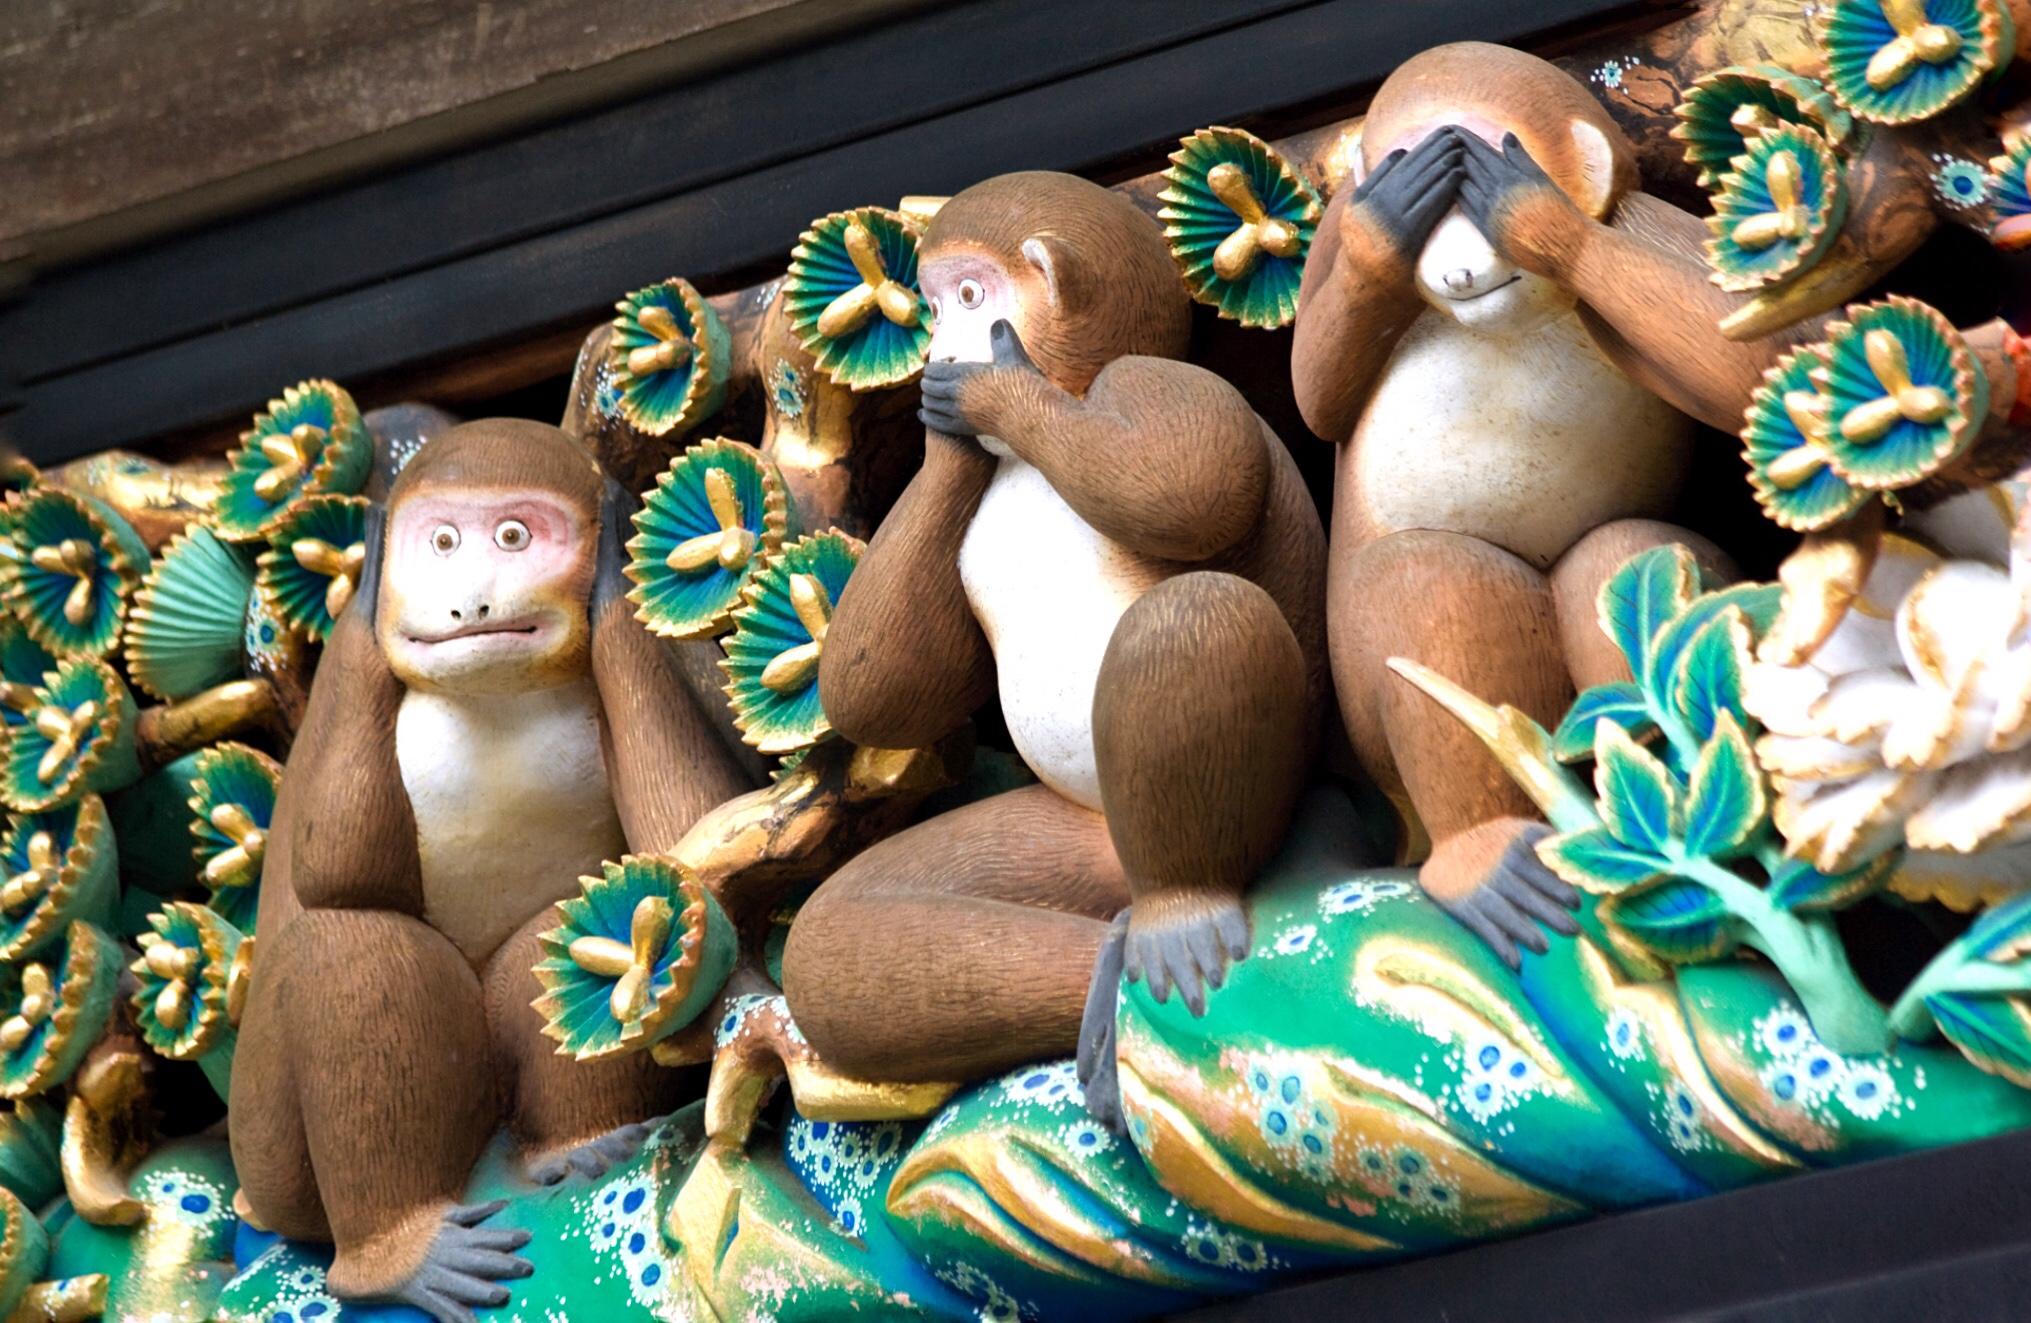 The Three Wise Monkeys of Tōshōgū Shrine in Nikko, Japan